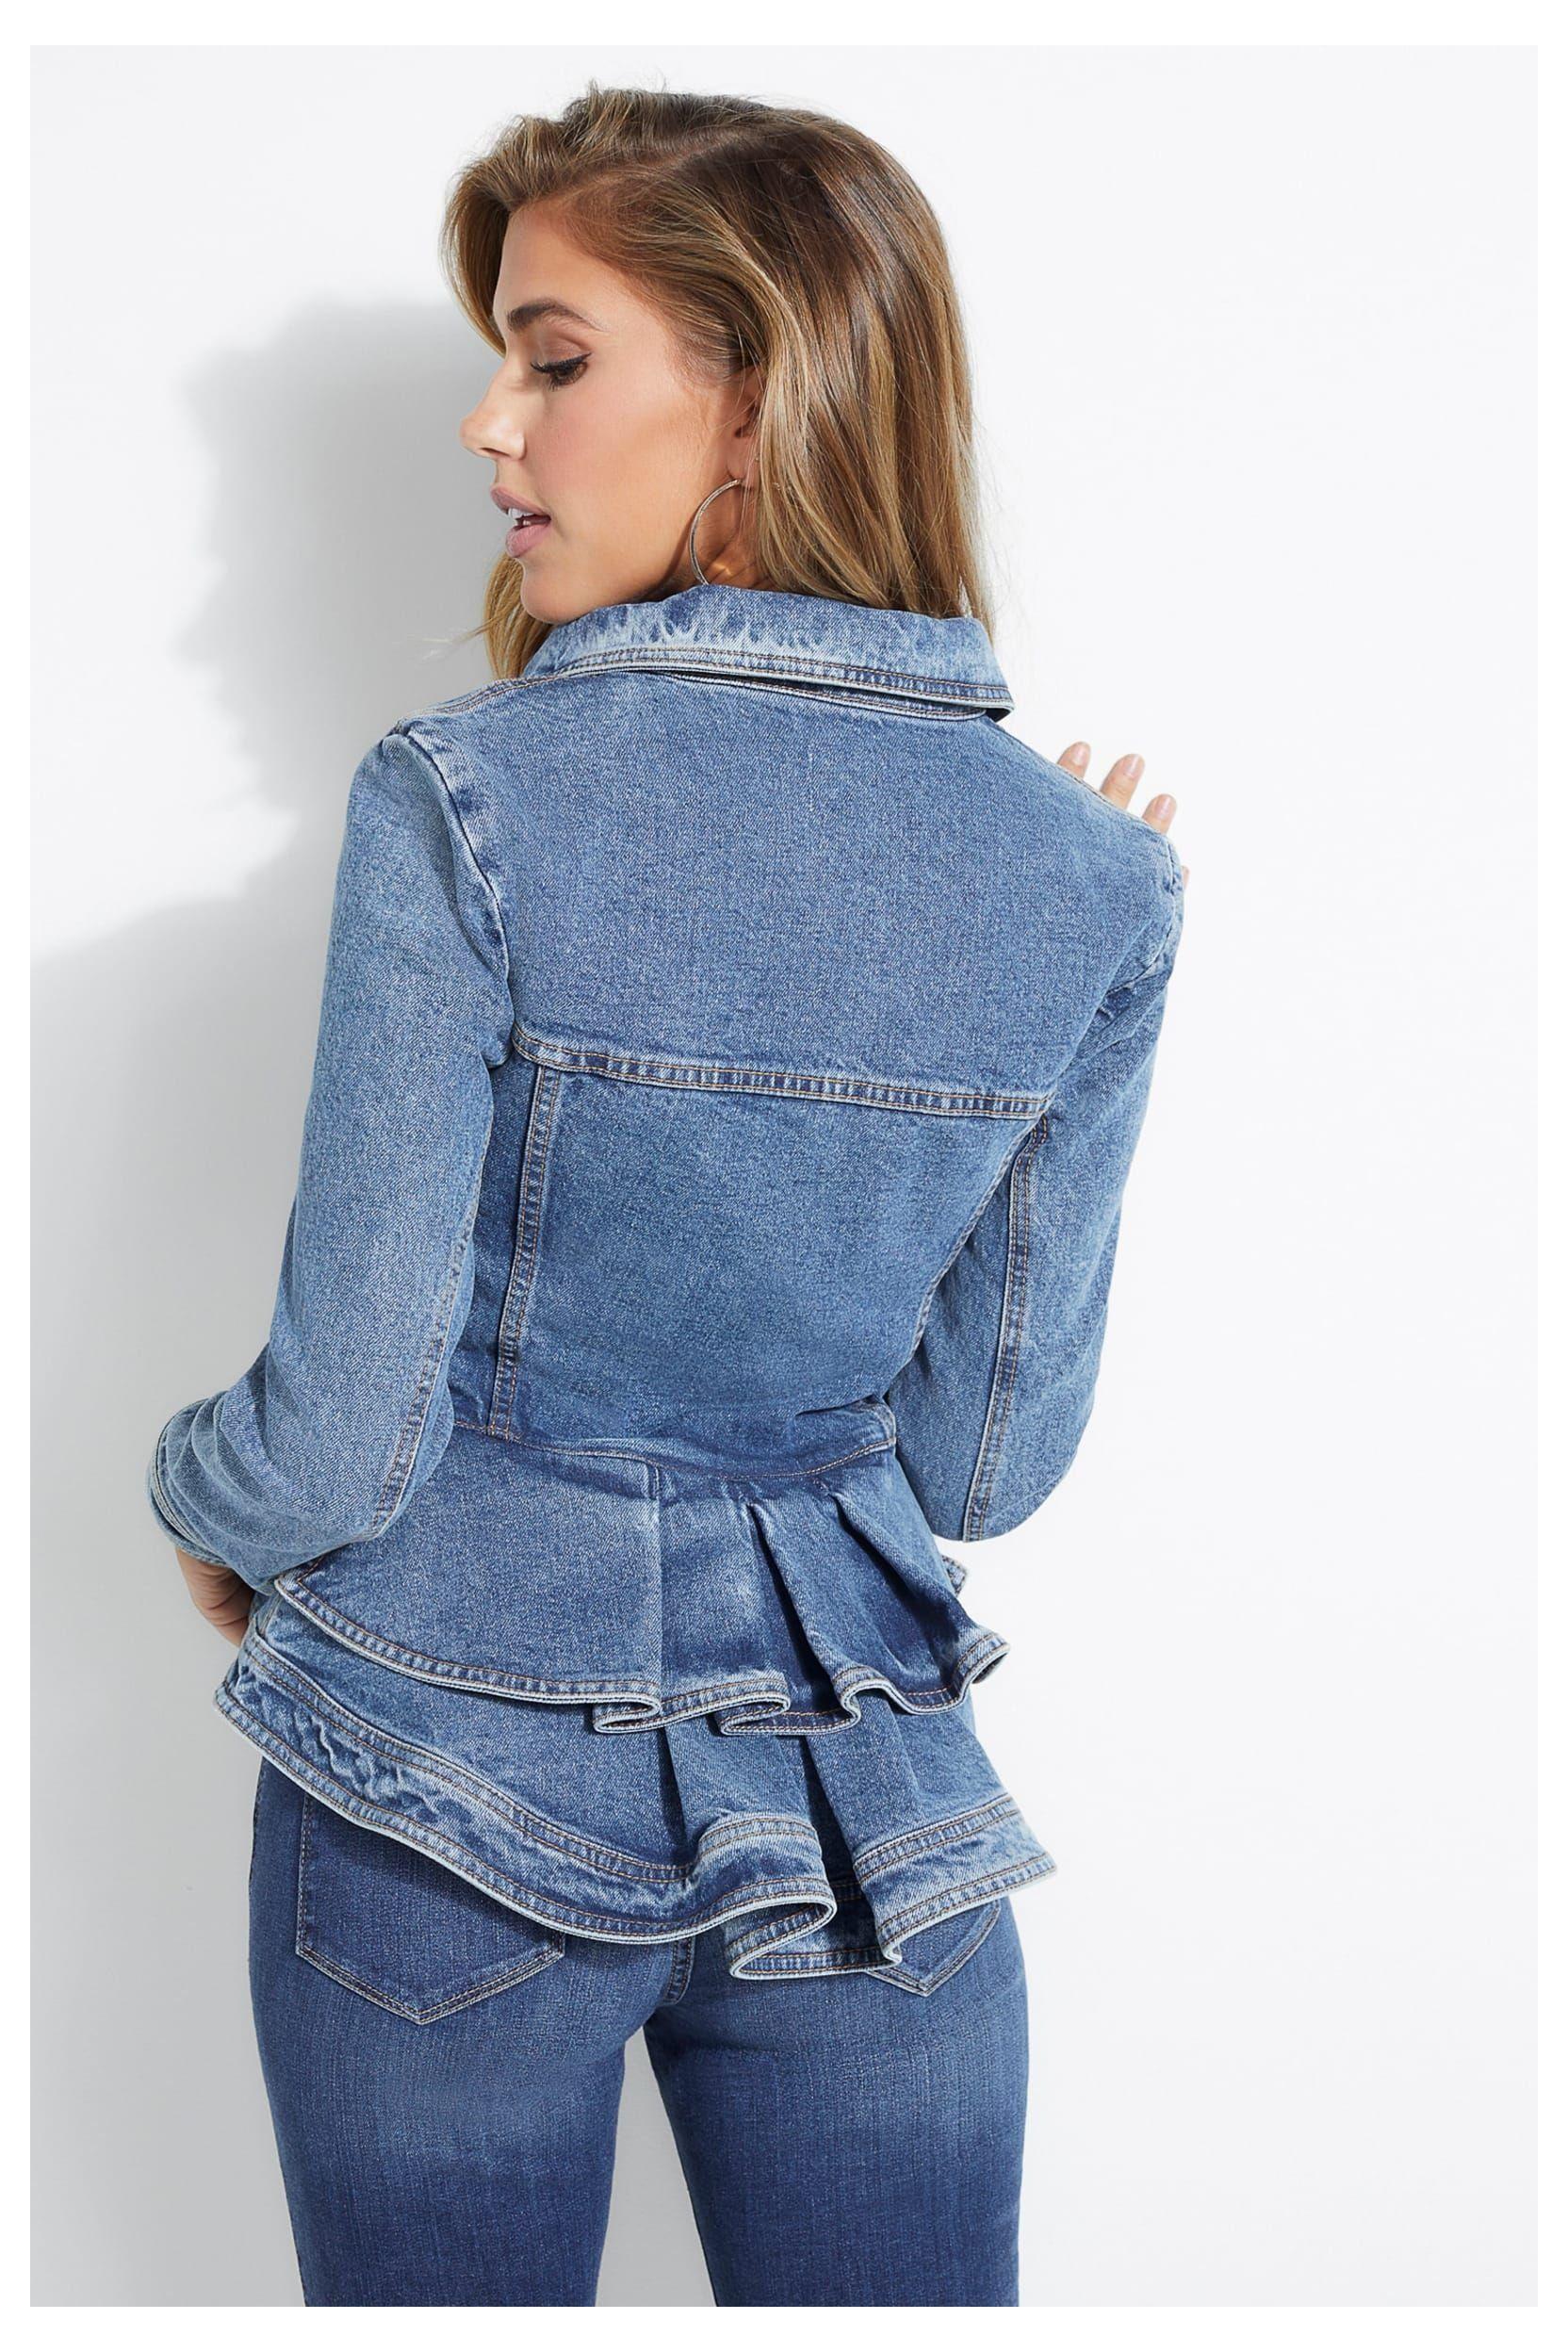 Peplum Denim Jacket Guess Guess Denim Jacket Women Guessdenimjacketwomen Shop Iconic Styles Like The Pe In 2021 Denim Fashion Denim Jacket Women Upcycle Clothes [ 2496 x 1664 Pixel ]